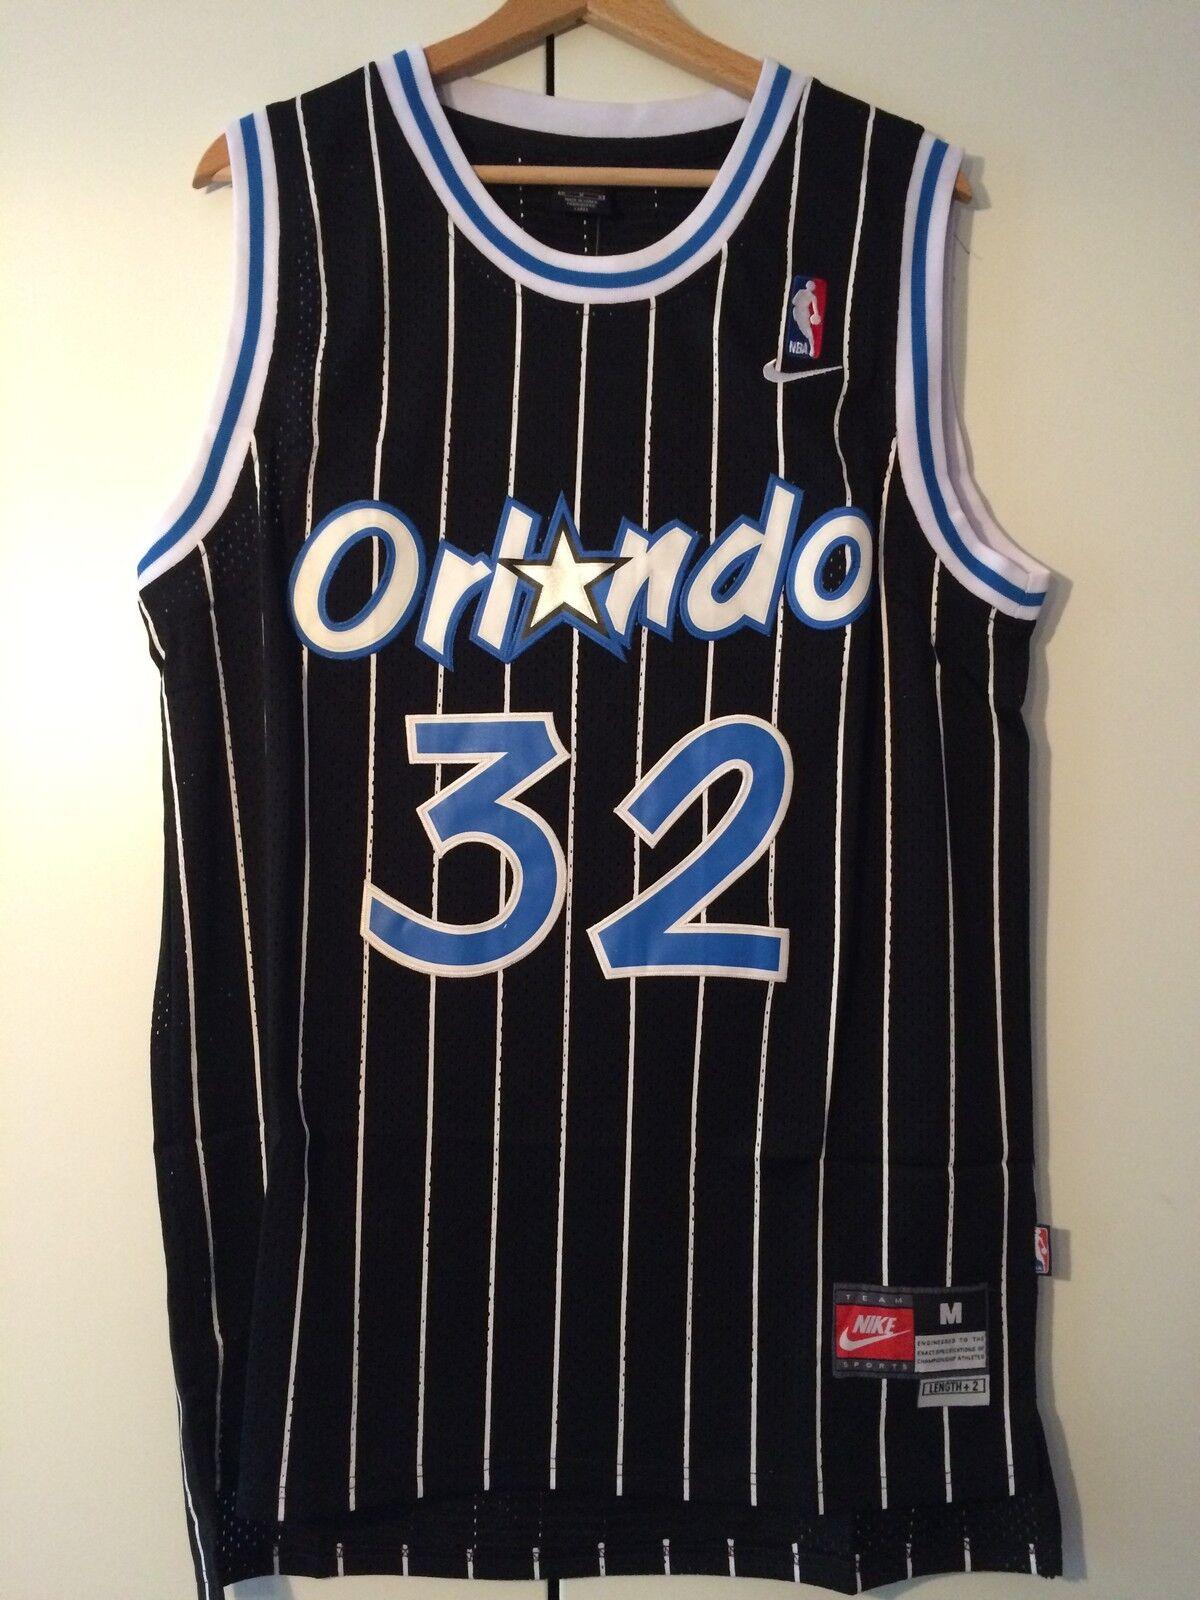 Canotta nba basket maglia Shaquille O'Neal jersey Orlando Magic New S/M/L/XL/XXL